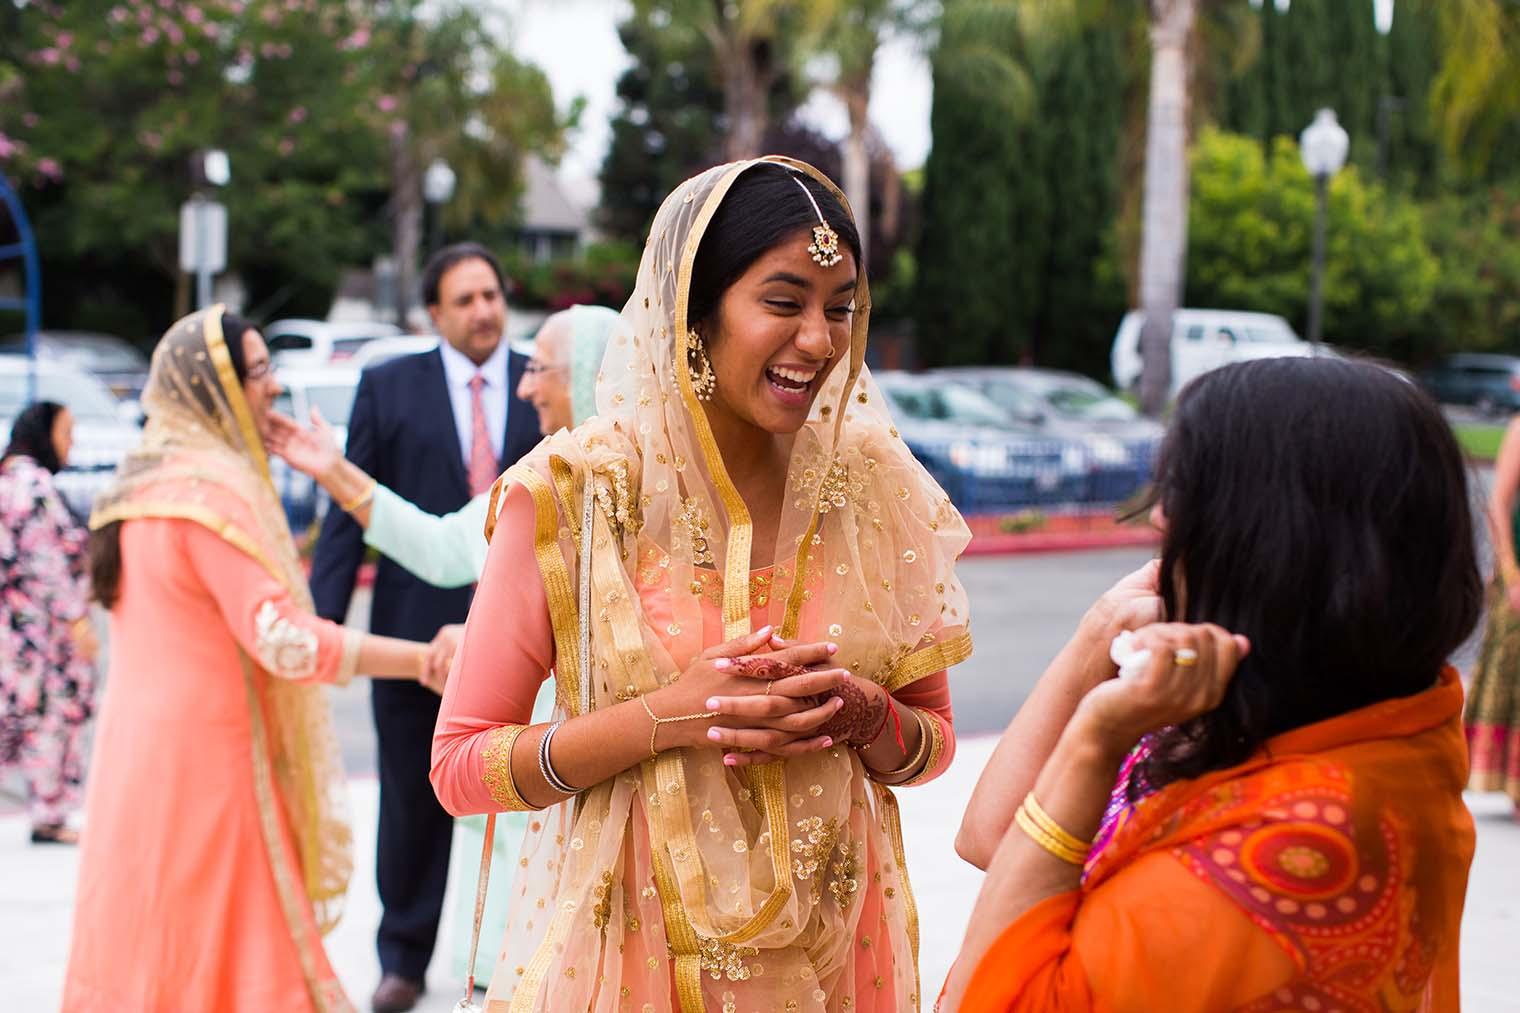 Gurdwara Sahib of Fremont Wedding Photos